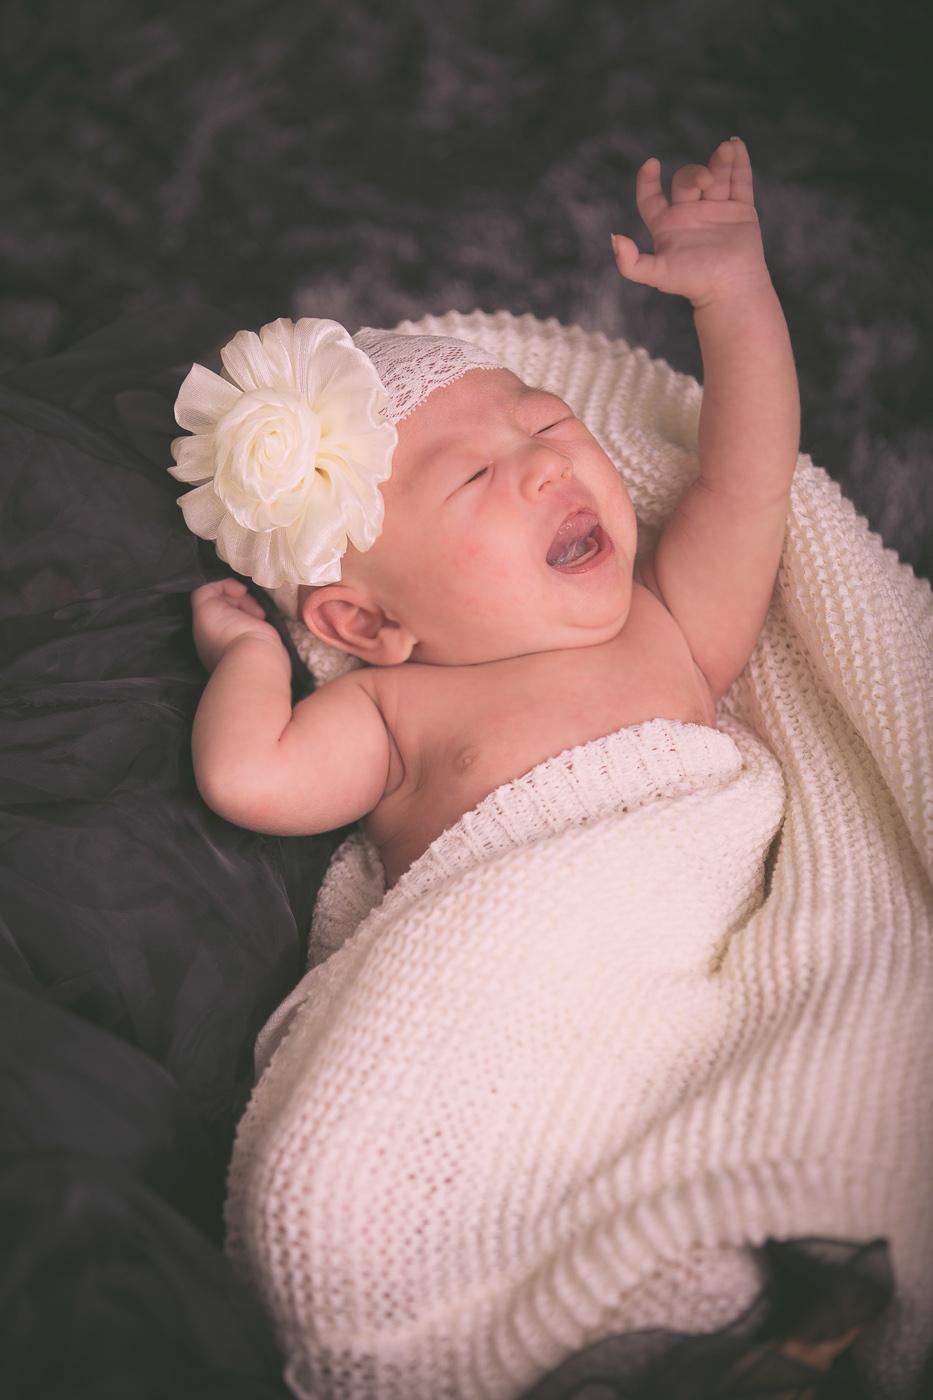 penang-baby-photographer-14.jpg